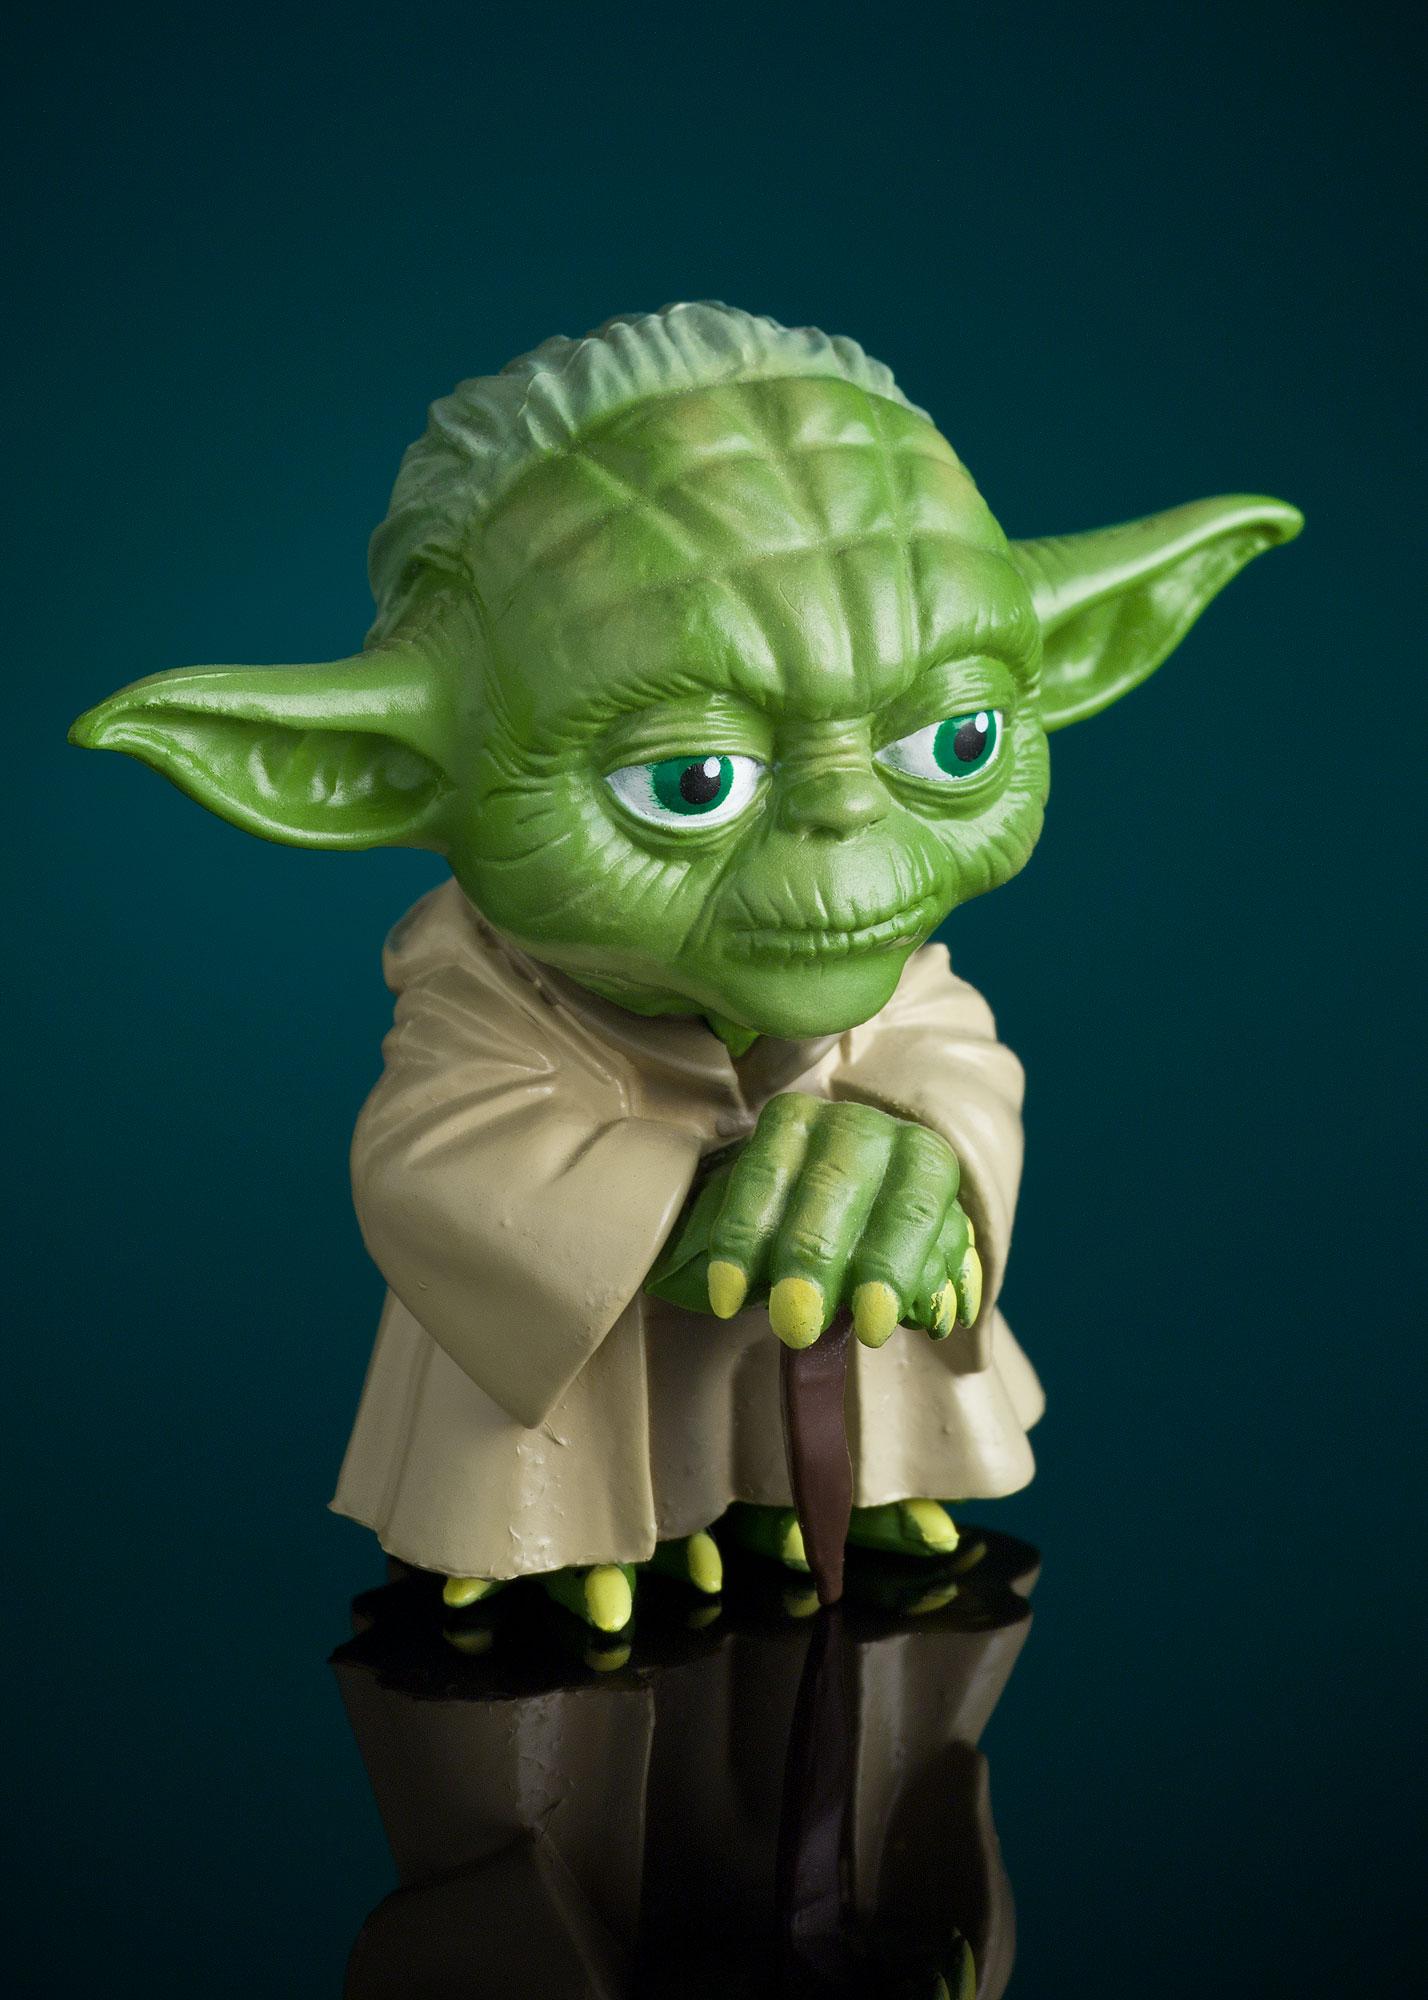 Product Photography I: Yoda Figure by Alex Kay